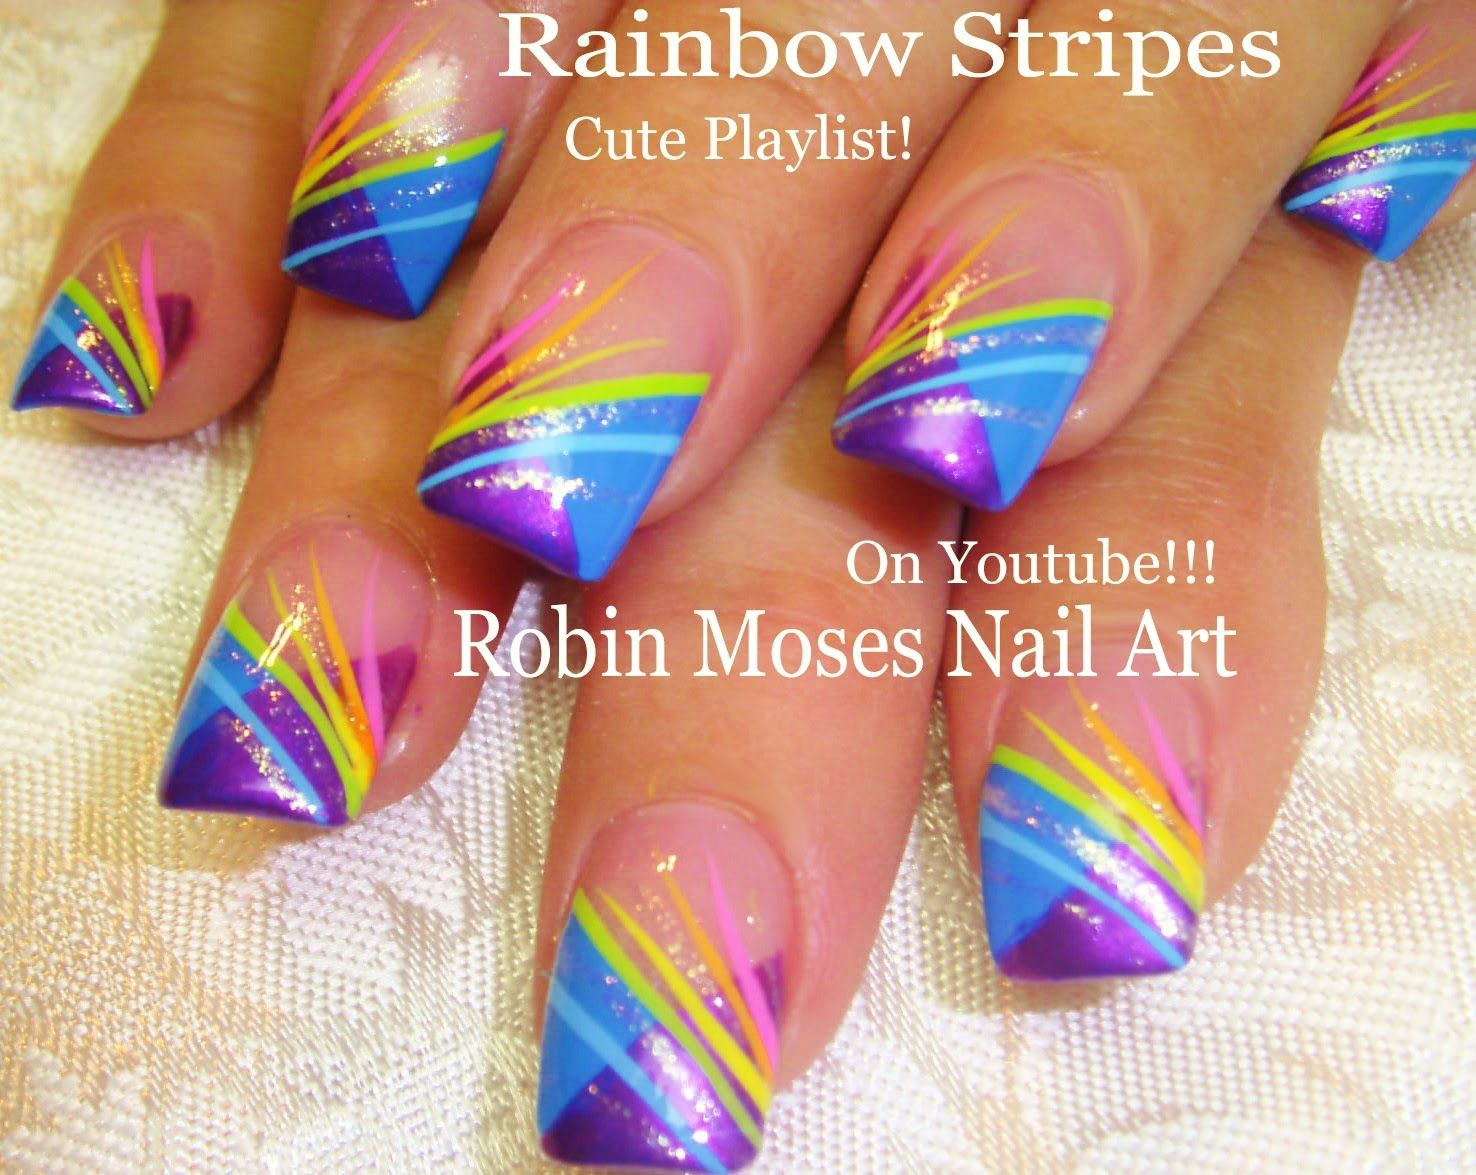 Nail Art Tutorial | DIY EASY Rainbow Striped Nails | Chevron French ...